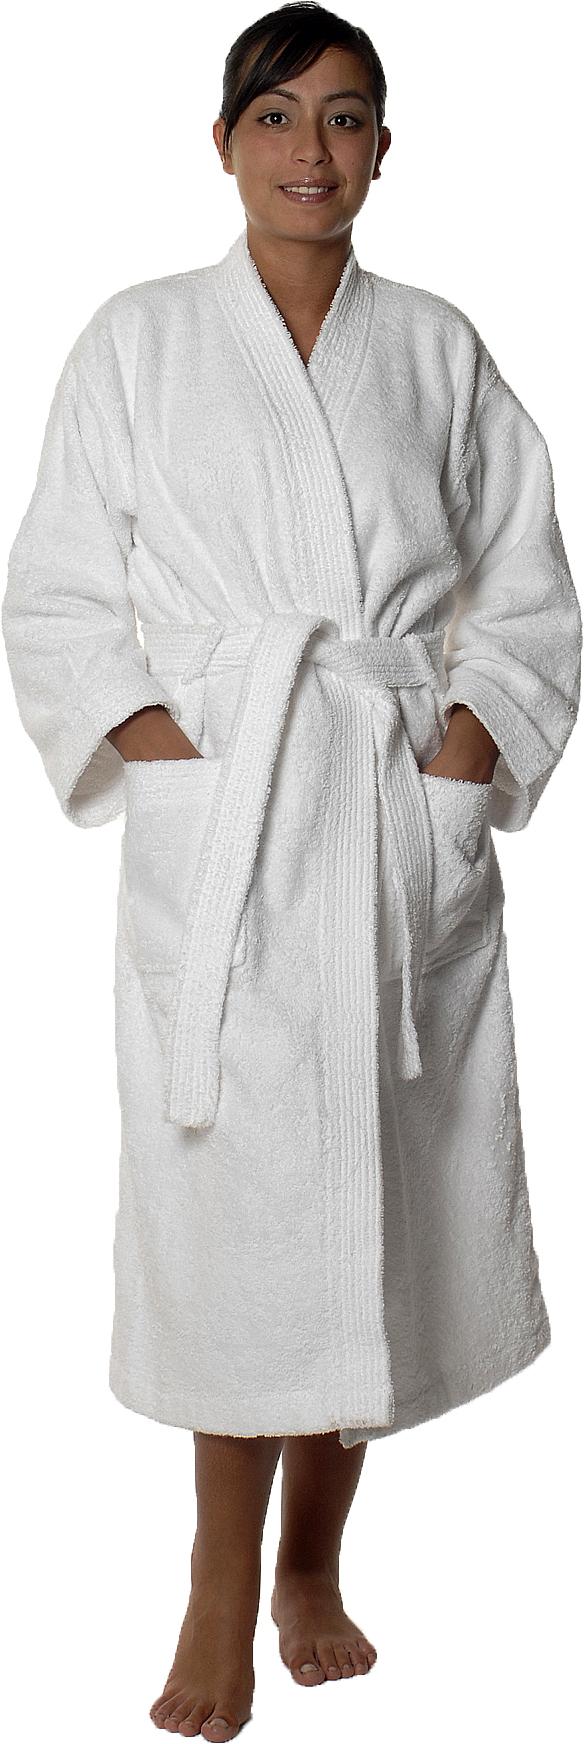 Peignoir col kimono en Coton couleur Blanc Taille XL (Blanc)